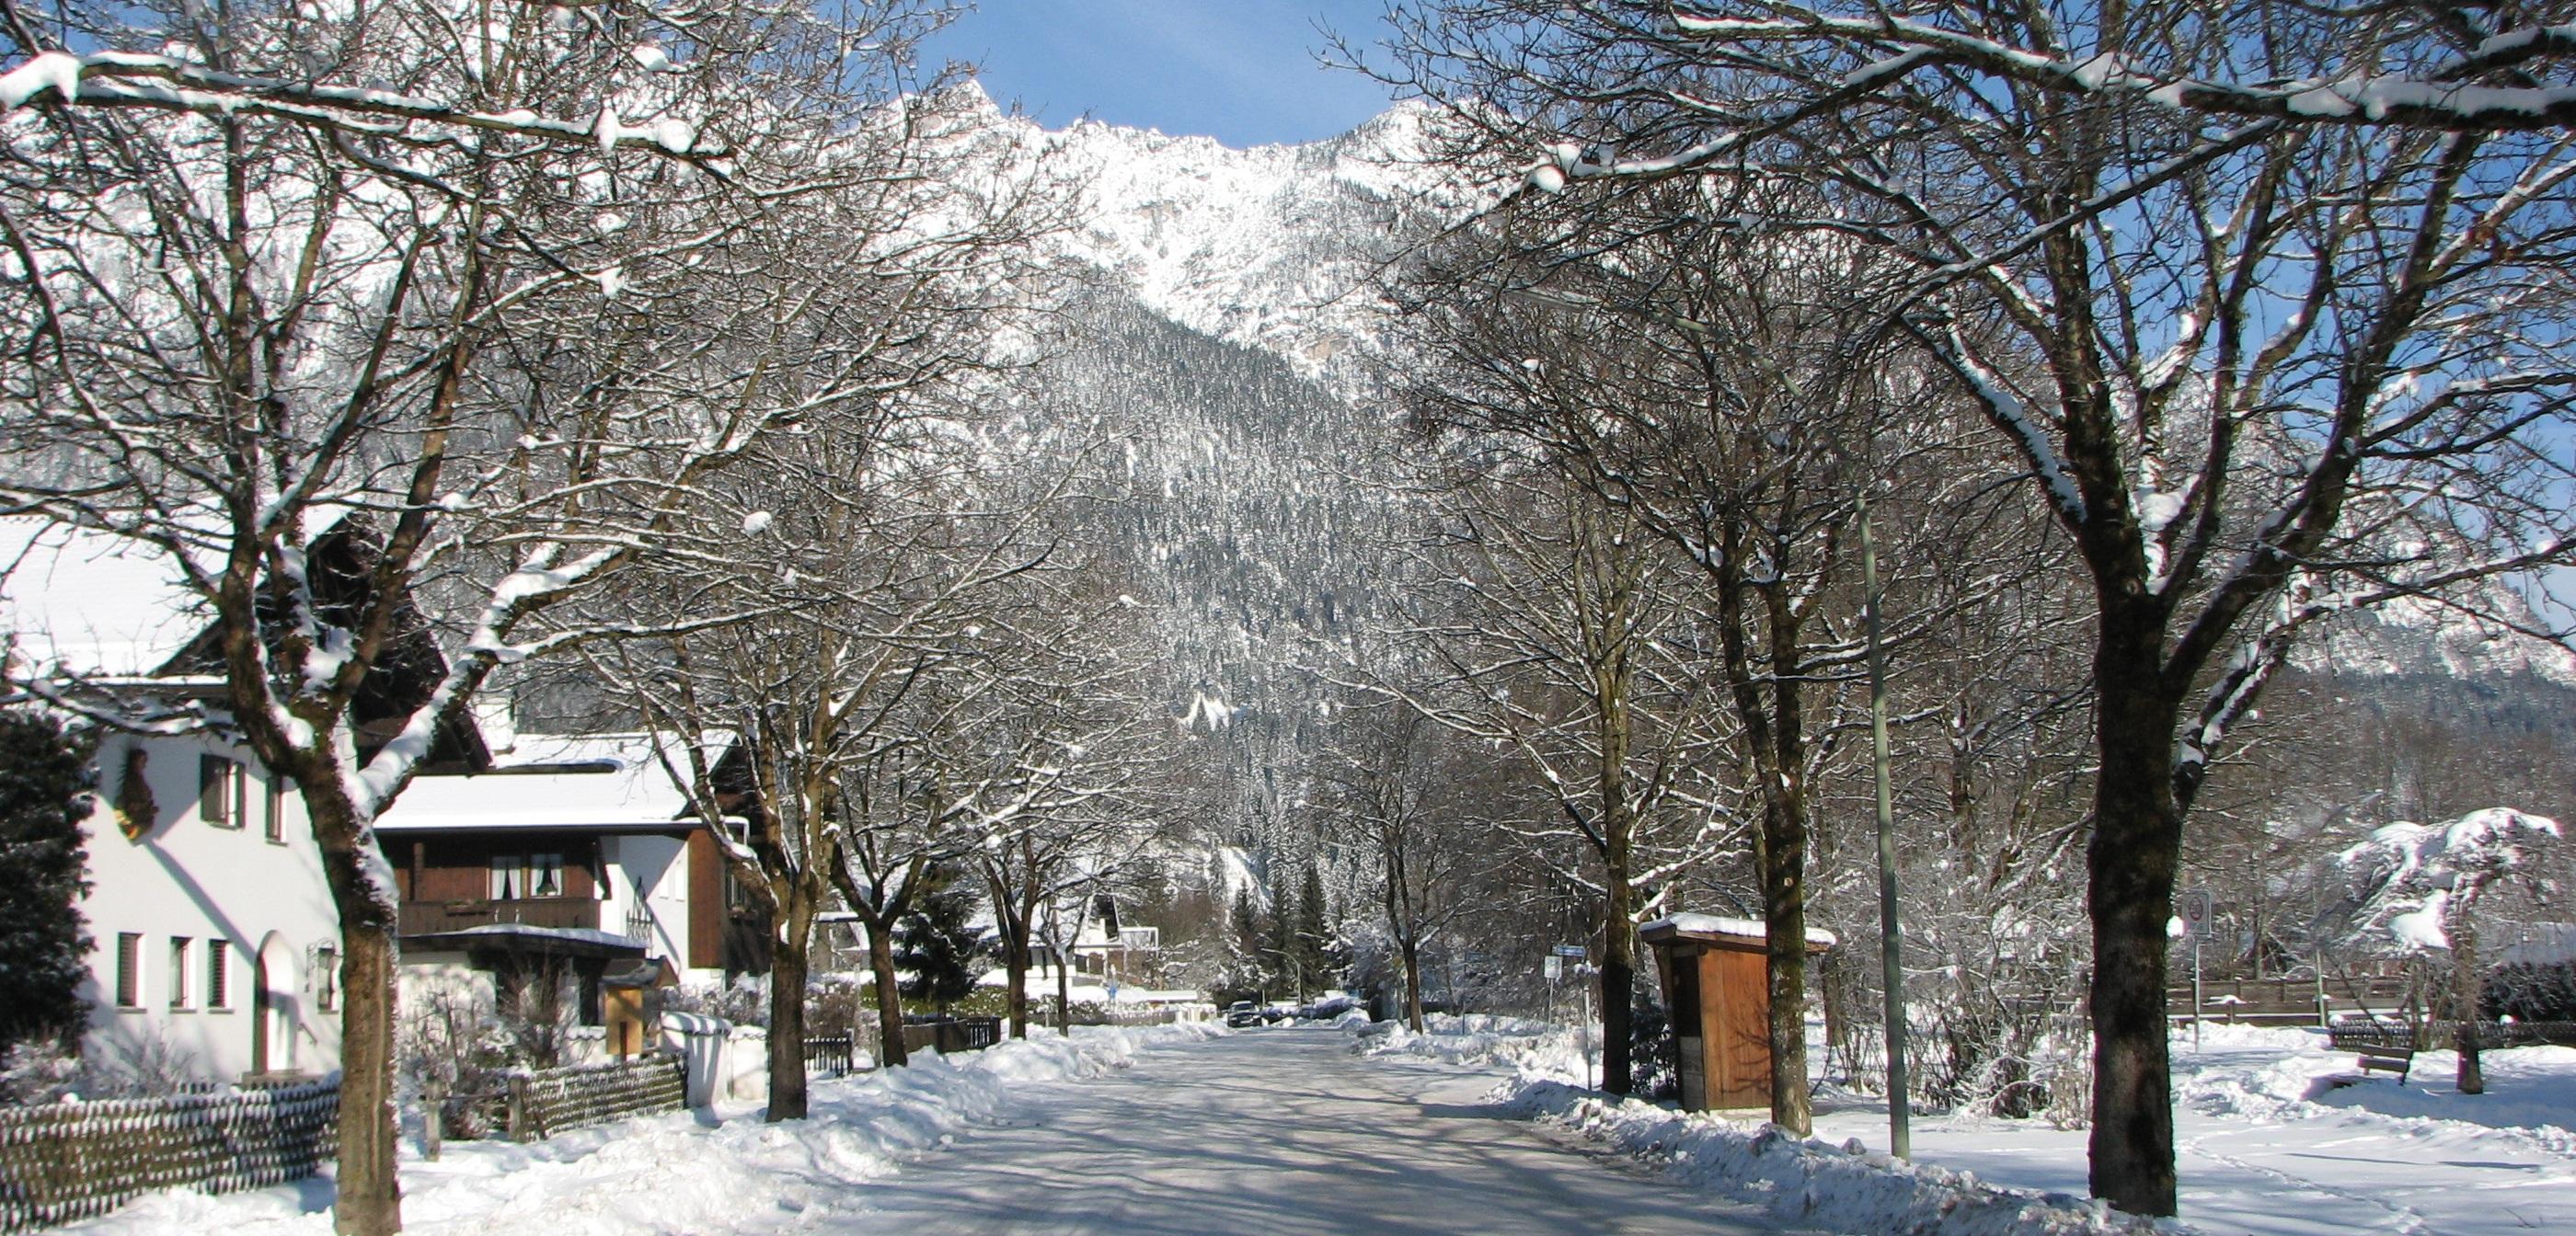 walking in snow in Garmisch